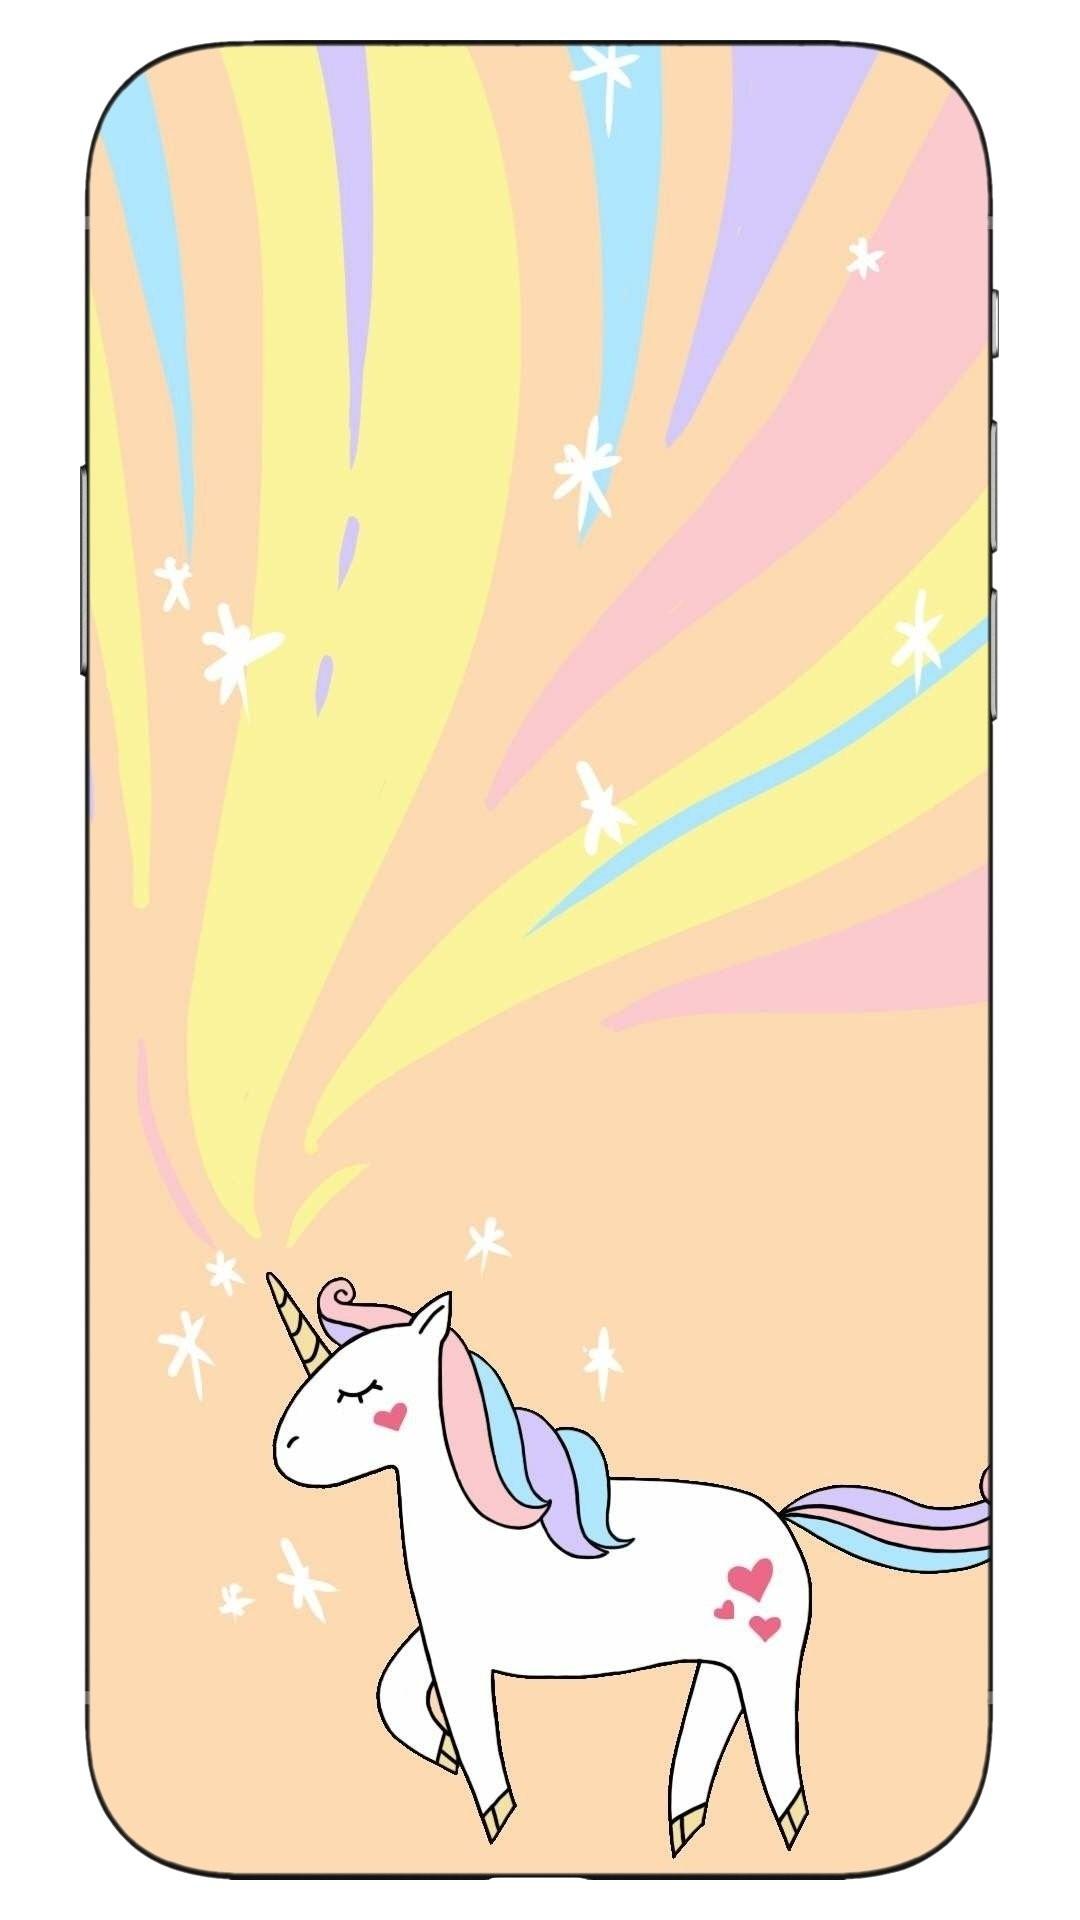 Unicorn iPhone 5 wallpaper